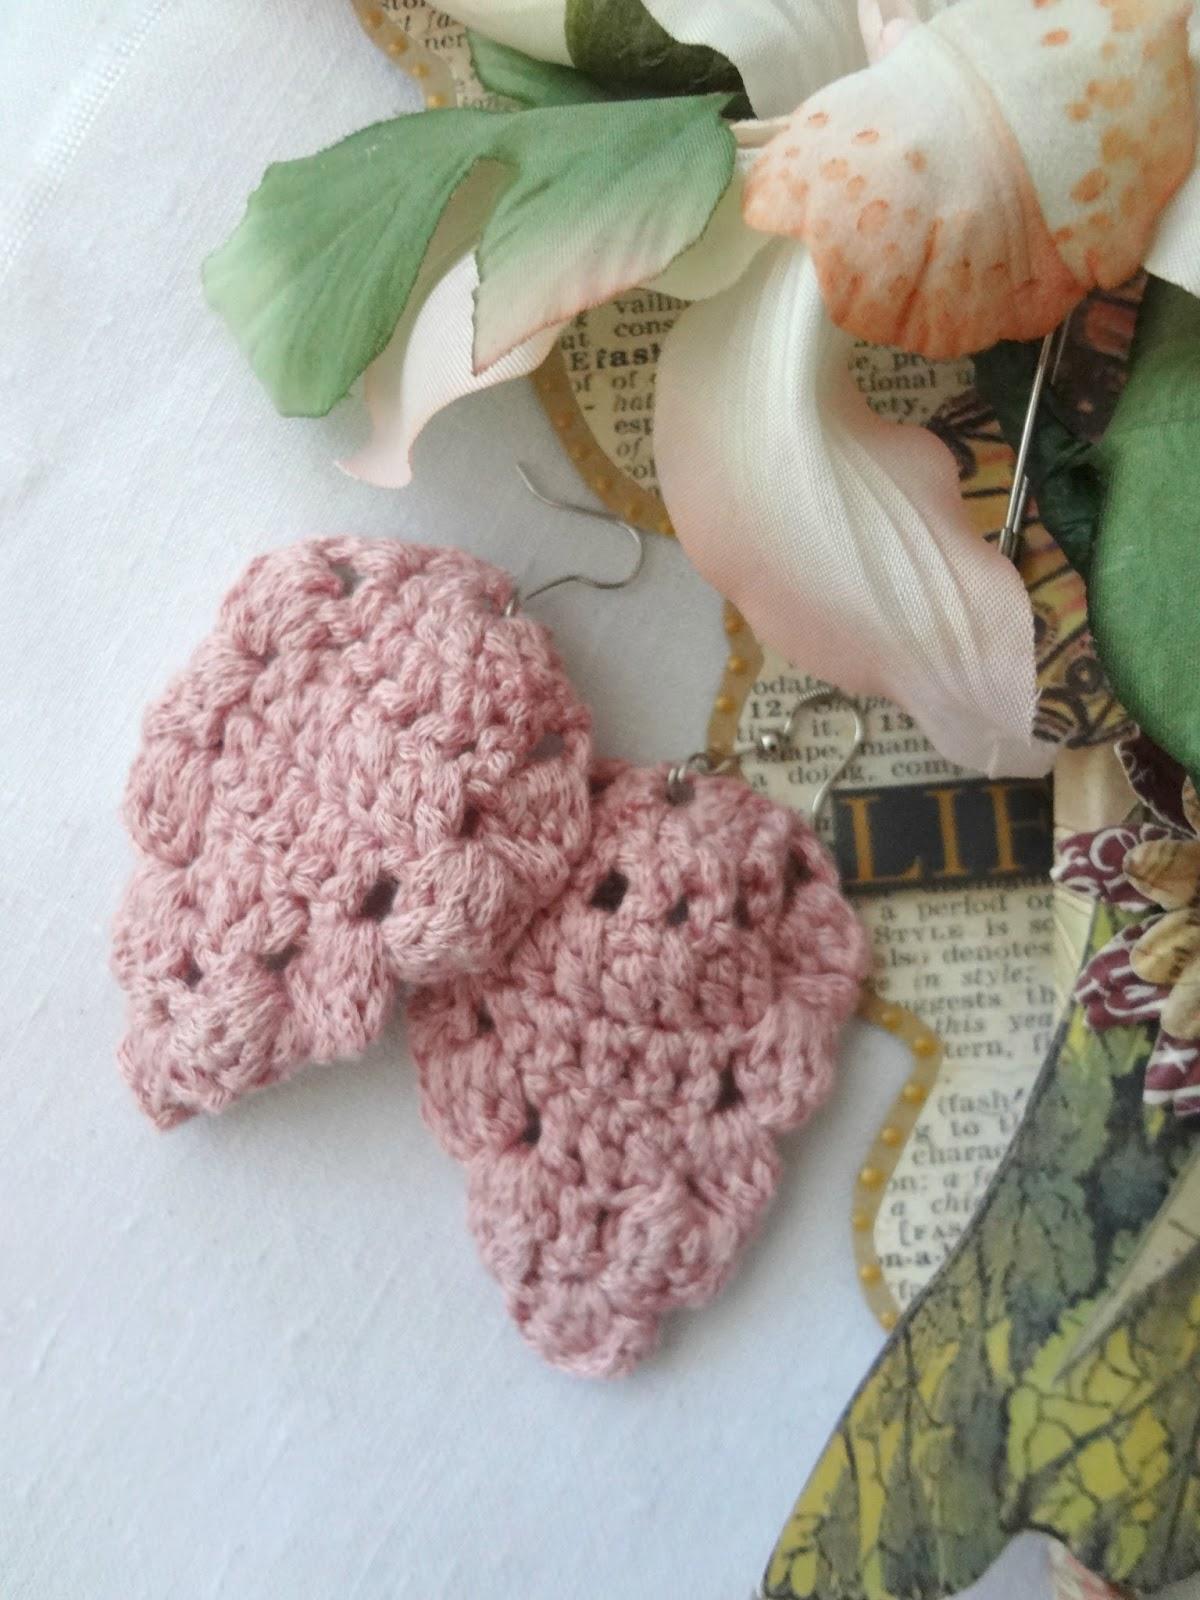 Little treasures pineapple motif earrings crochet pattern pineapple motif earrings crochet pattern dt1010fo